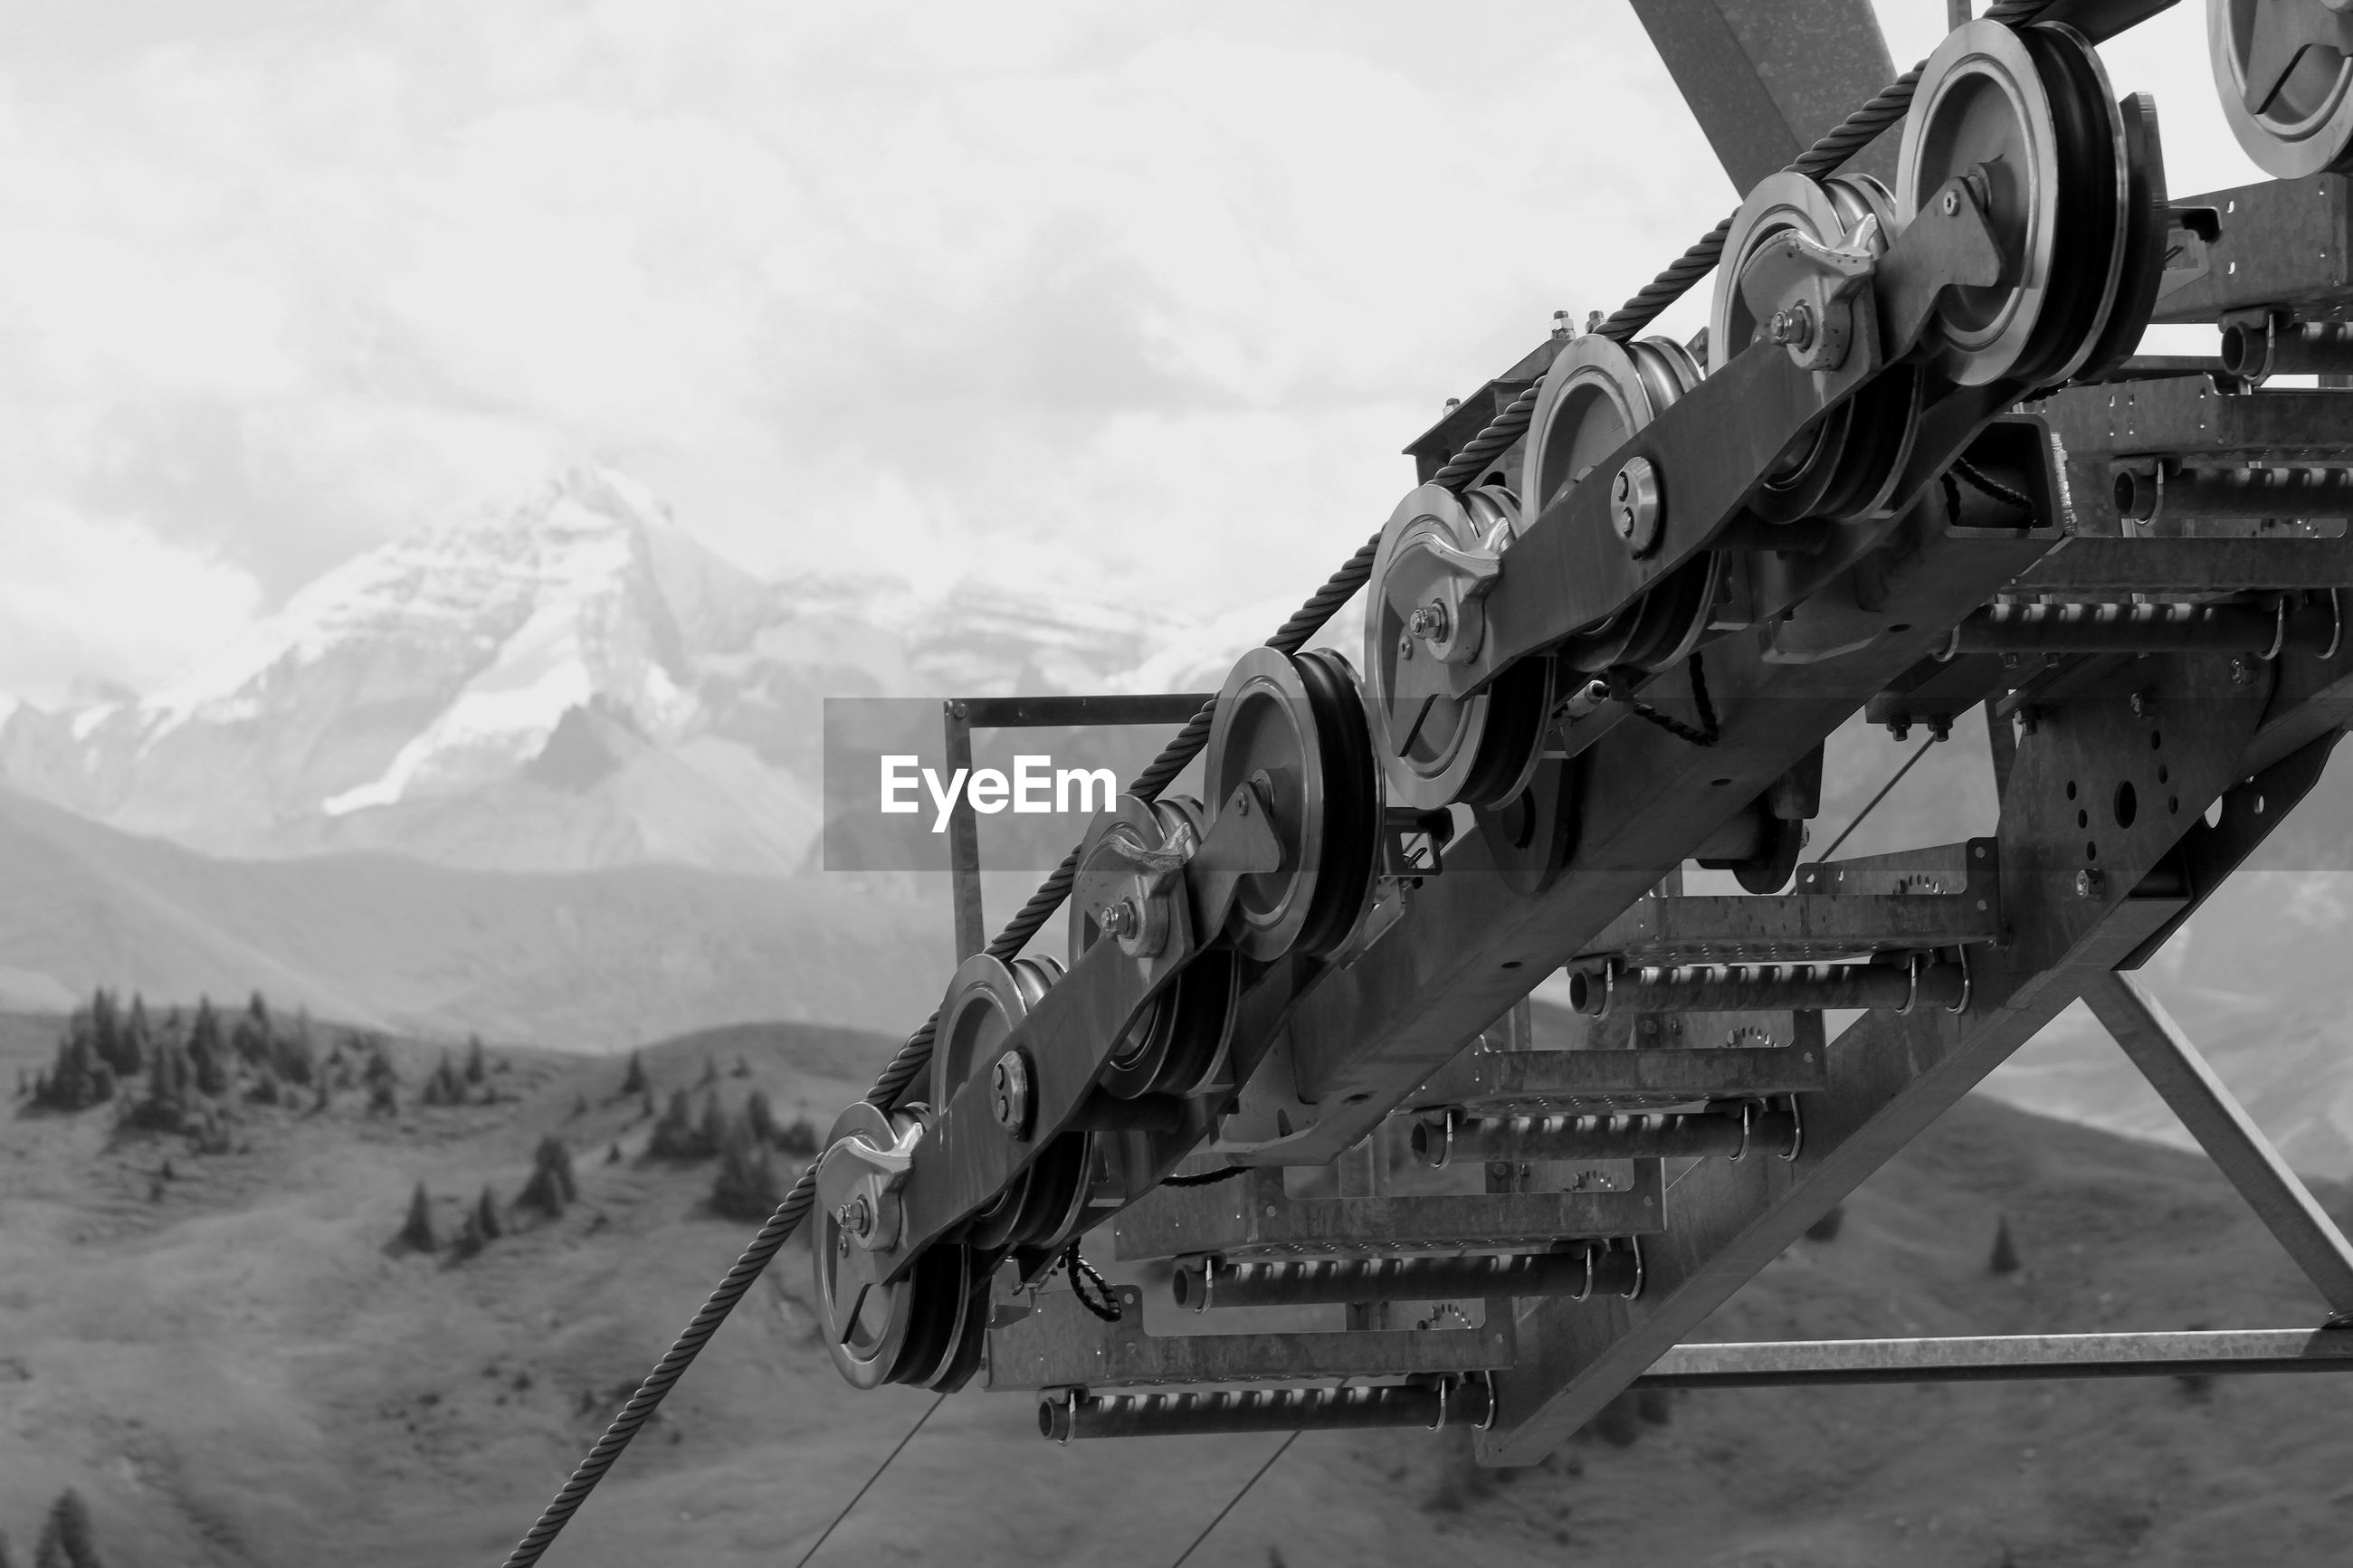 Close-up of machine part against sky